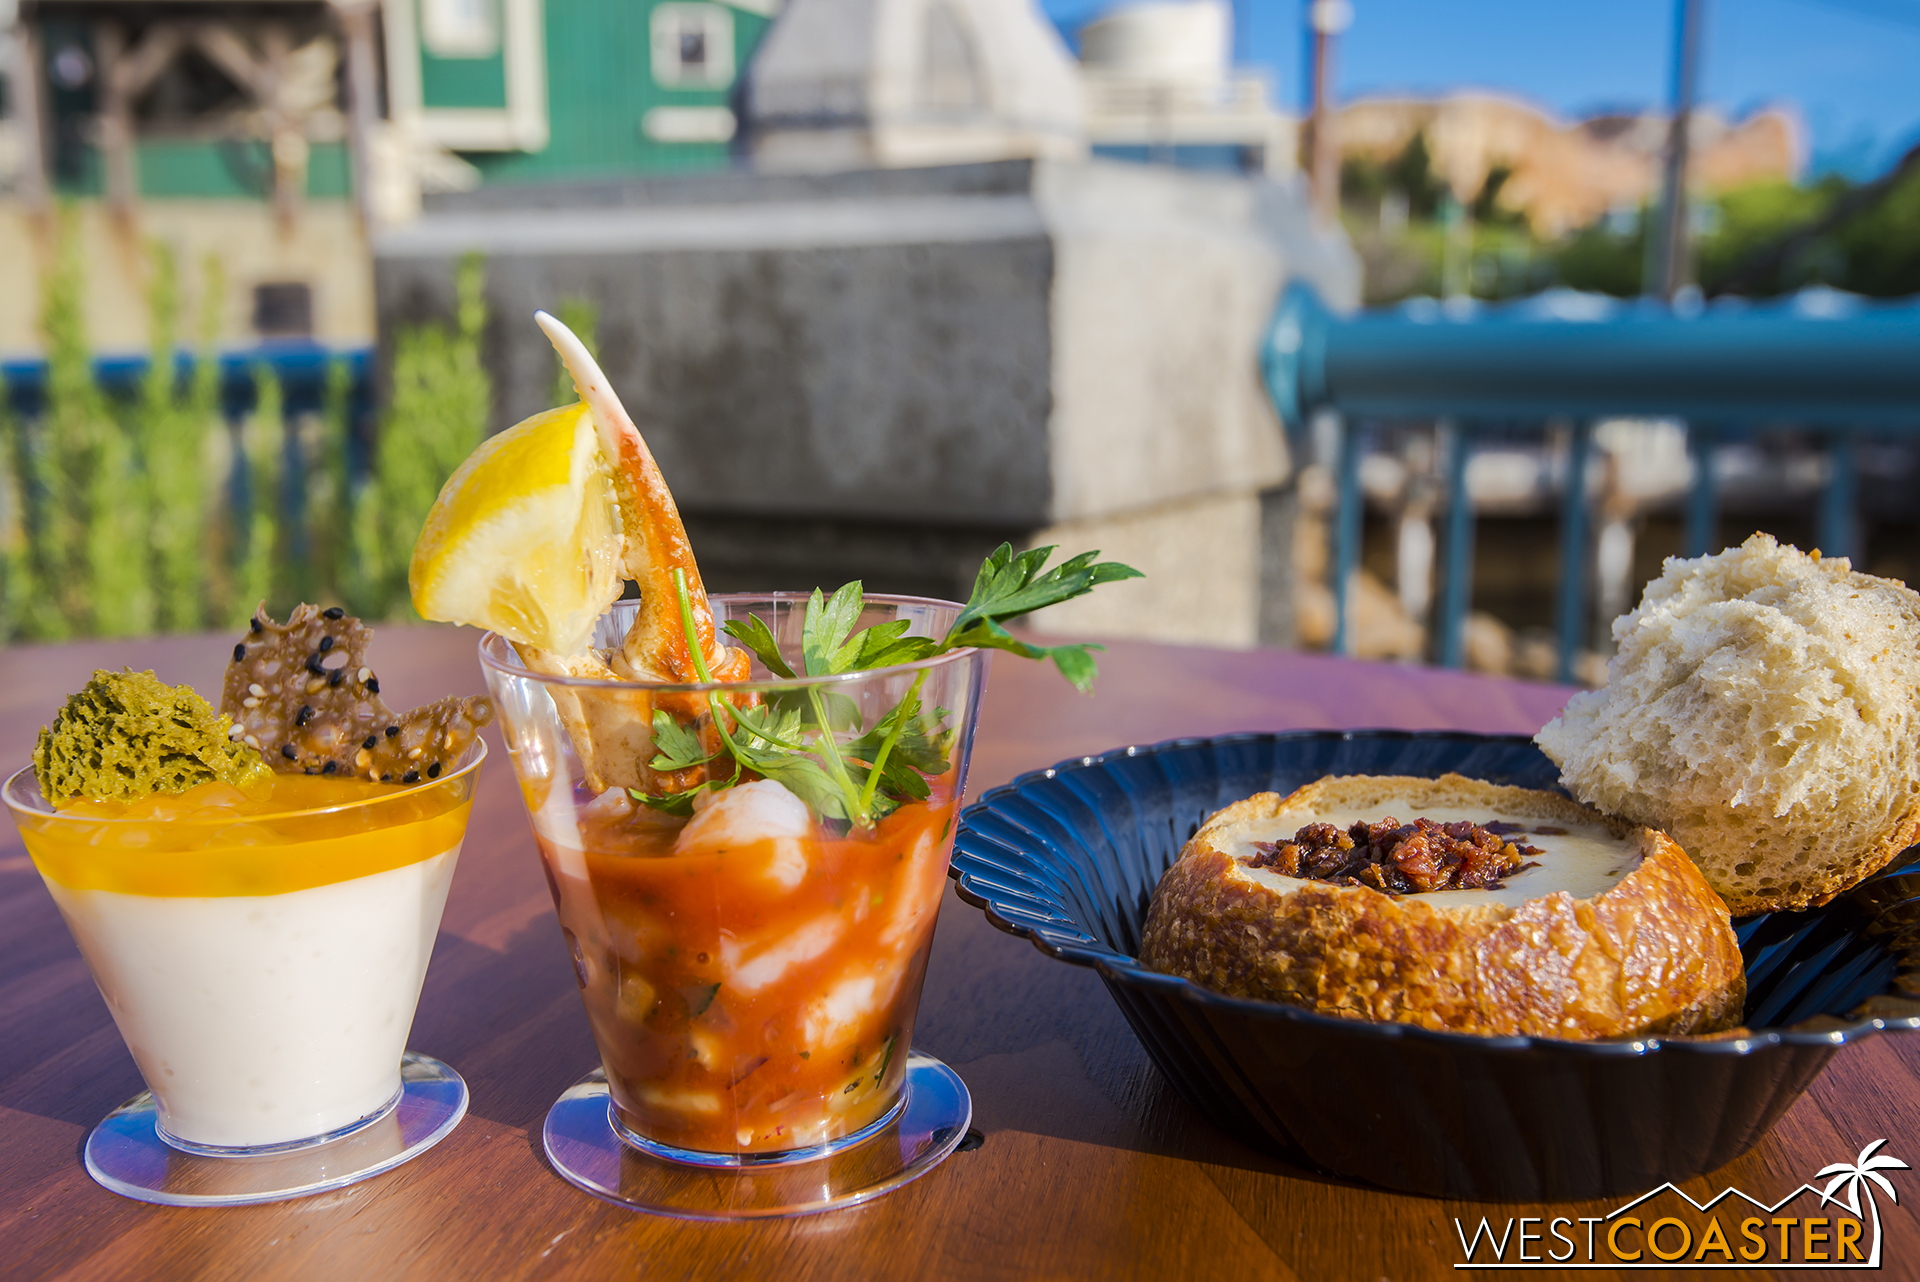 A mango lychee tapioca dessert, a shrimp and snow crab cocktail, and CHOUP!!!